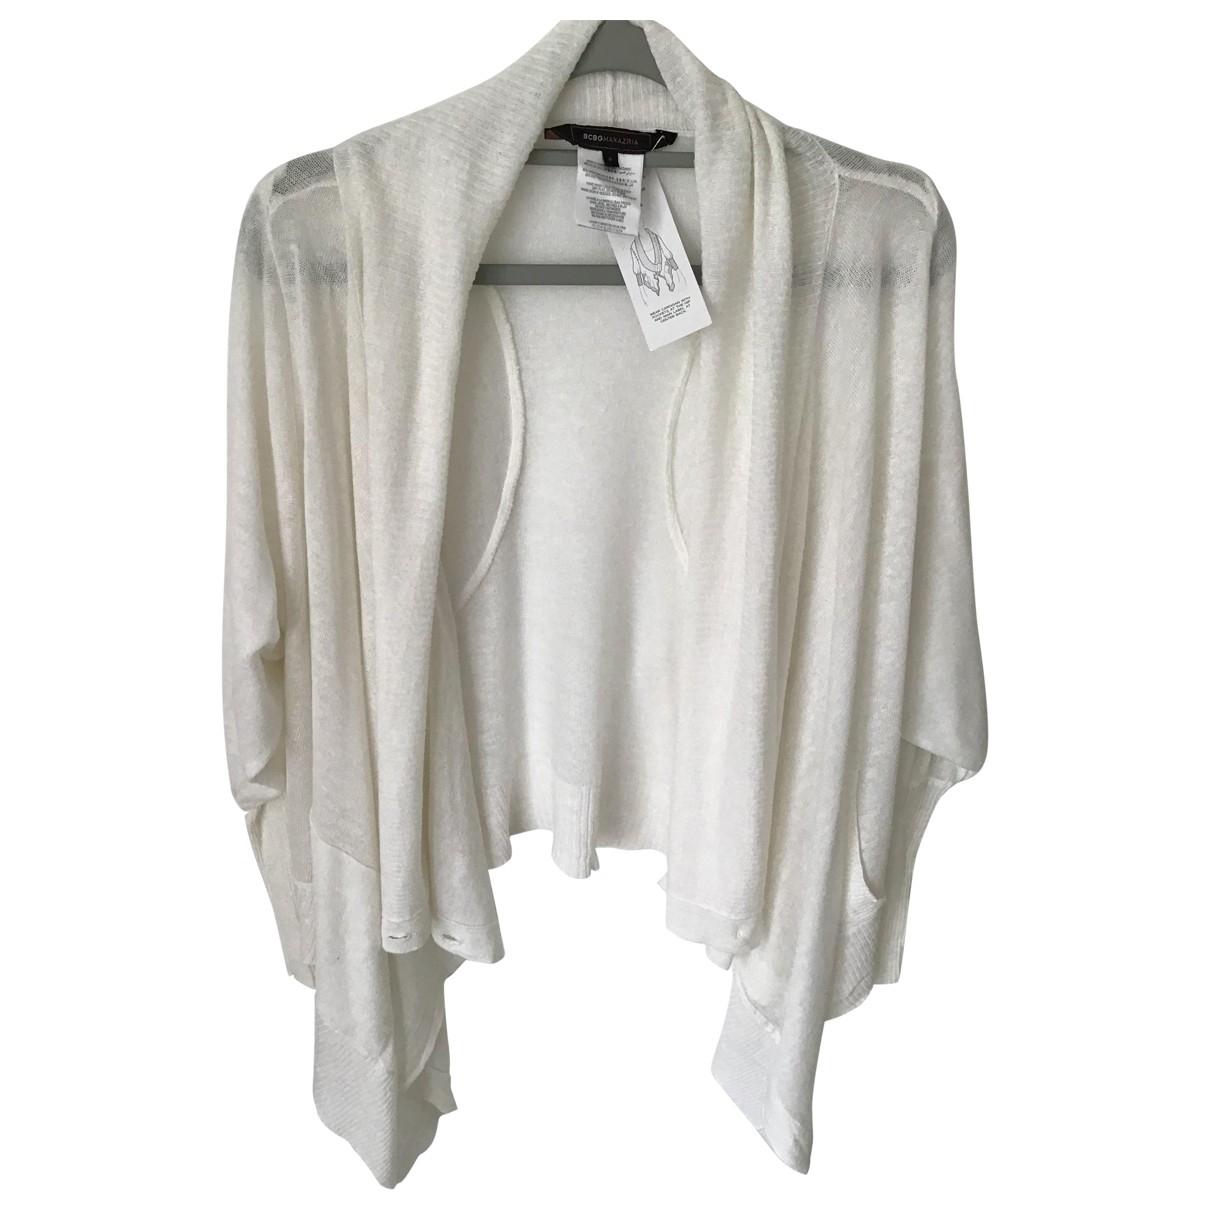 Bcbg Max Azria - Pull   pour femme en lin - blanc